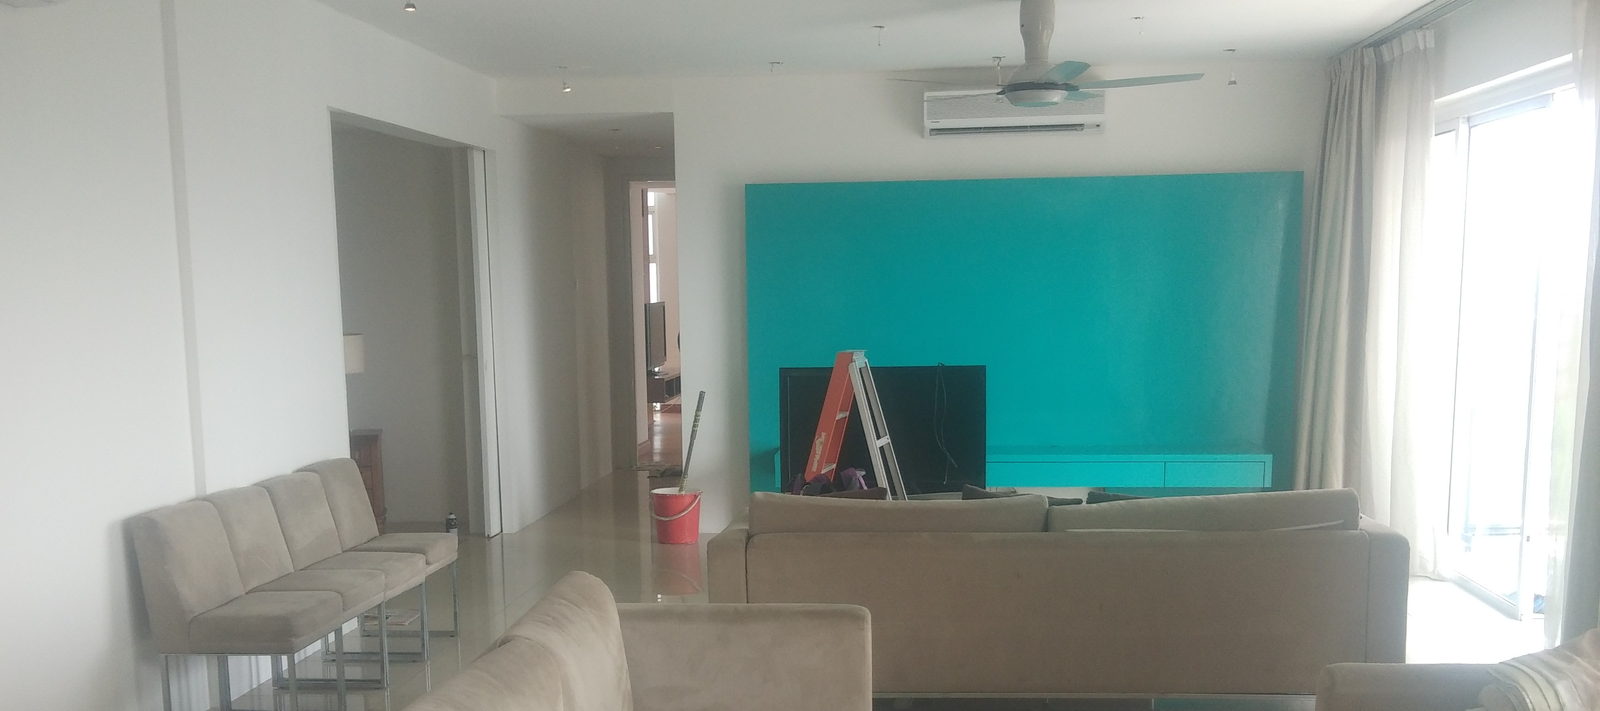 MaNe painting& renovere company